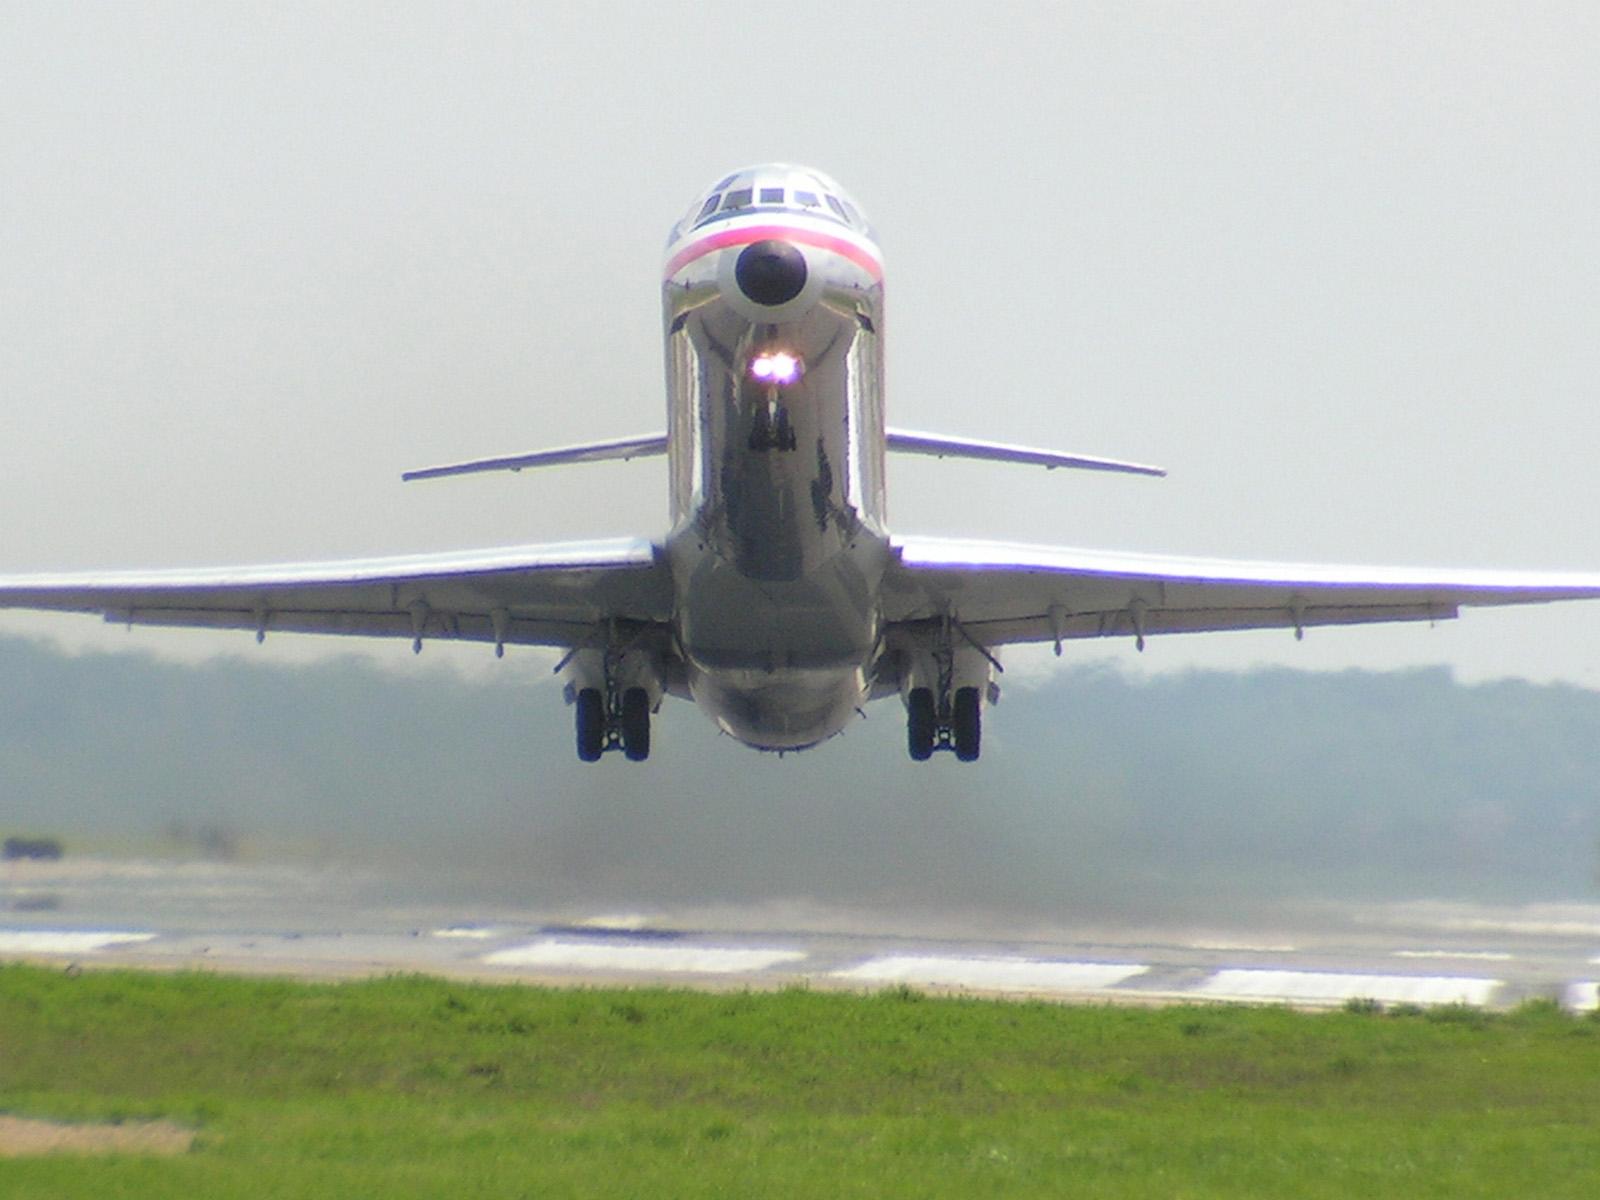 http://2.bp.blogspot.com/_qjNUXs1qvUw/TEEWMExuWgI/AAAAAAAAADc/6f9h18ncjHI/s1600/md80_takeoff.jpg